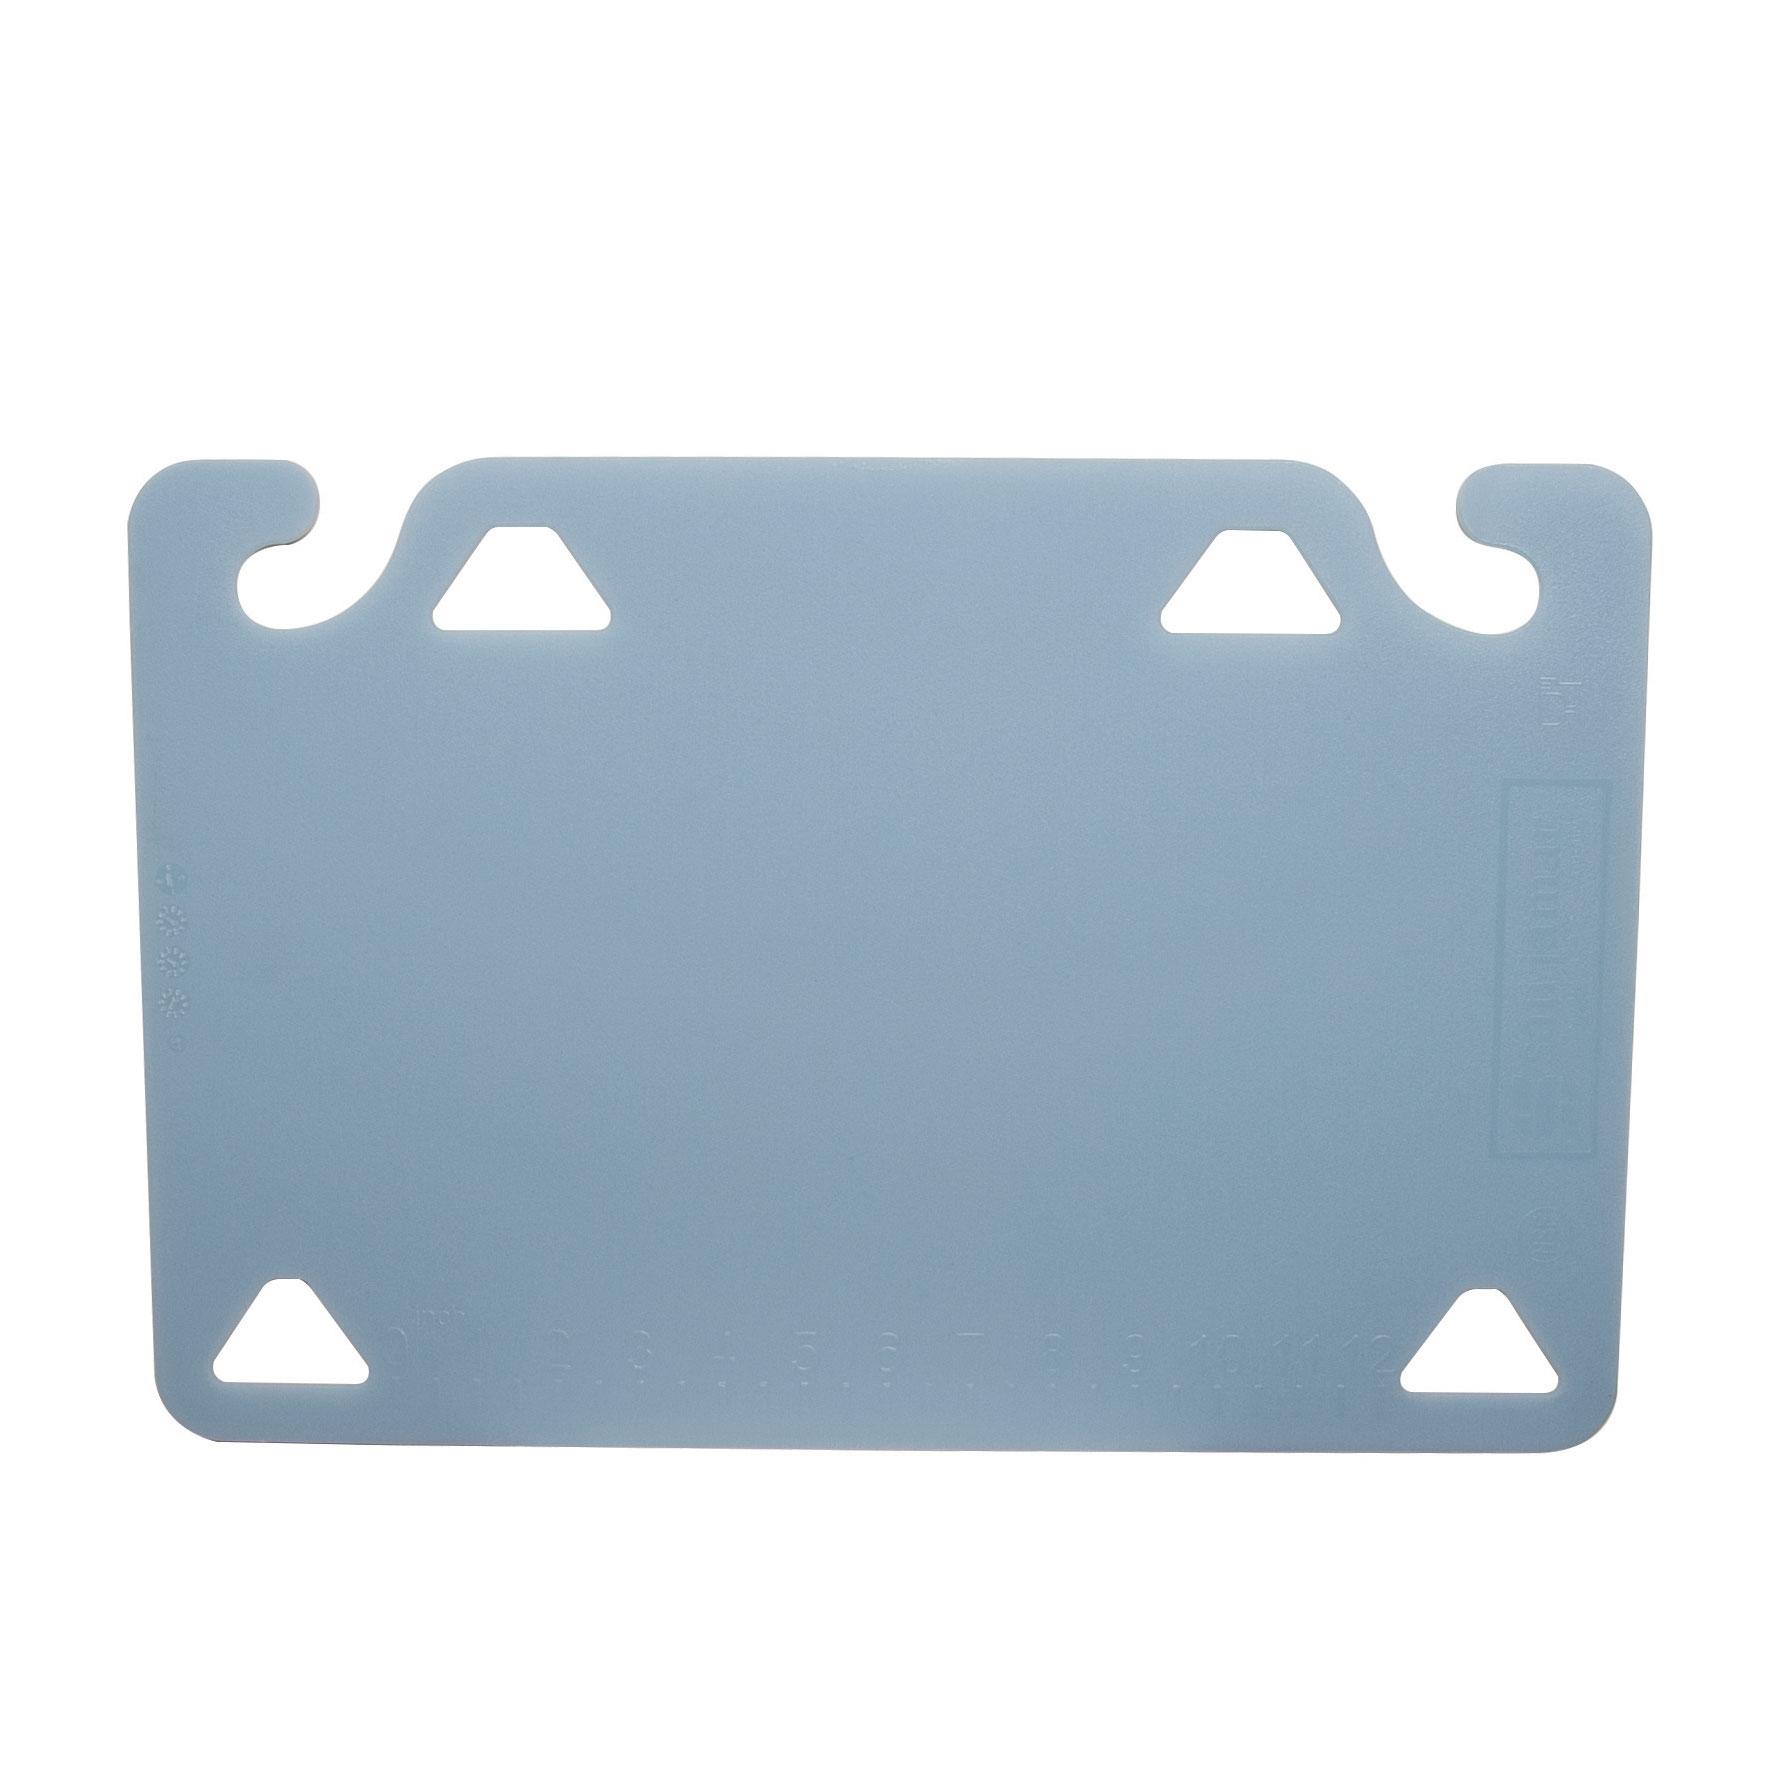 San Jamar CBQG1218BL cutting board, plastic